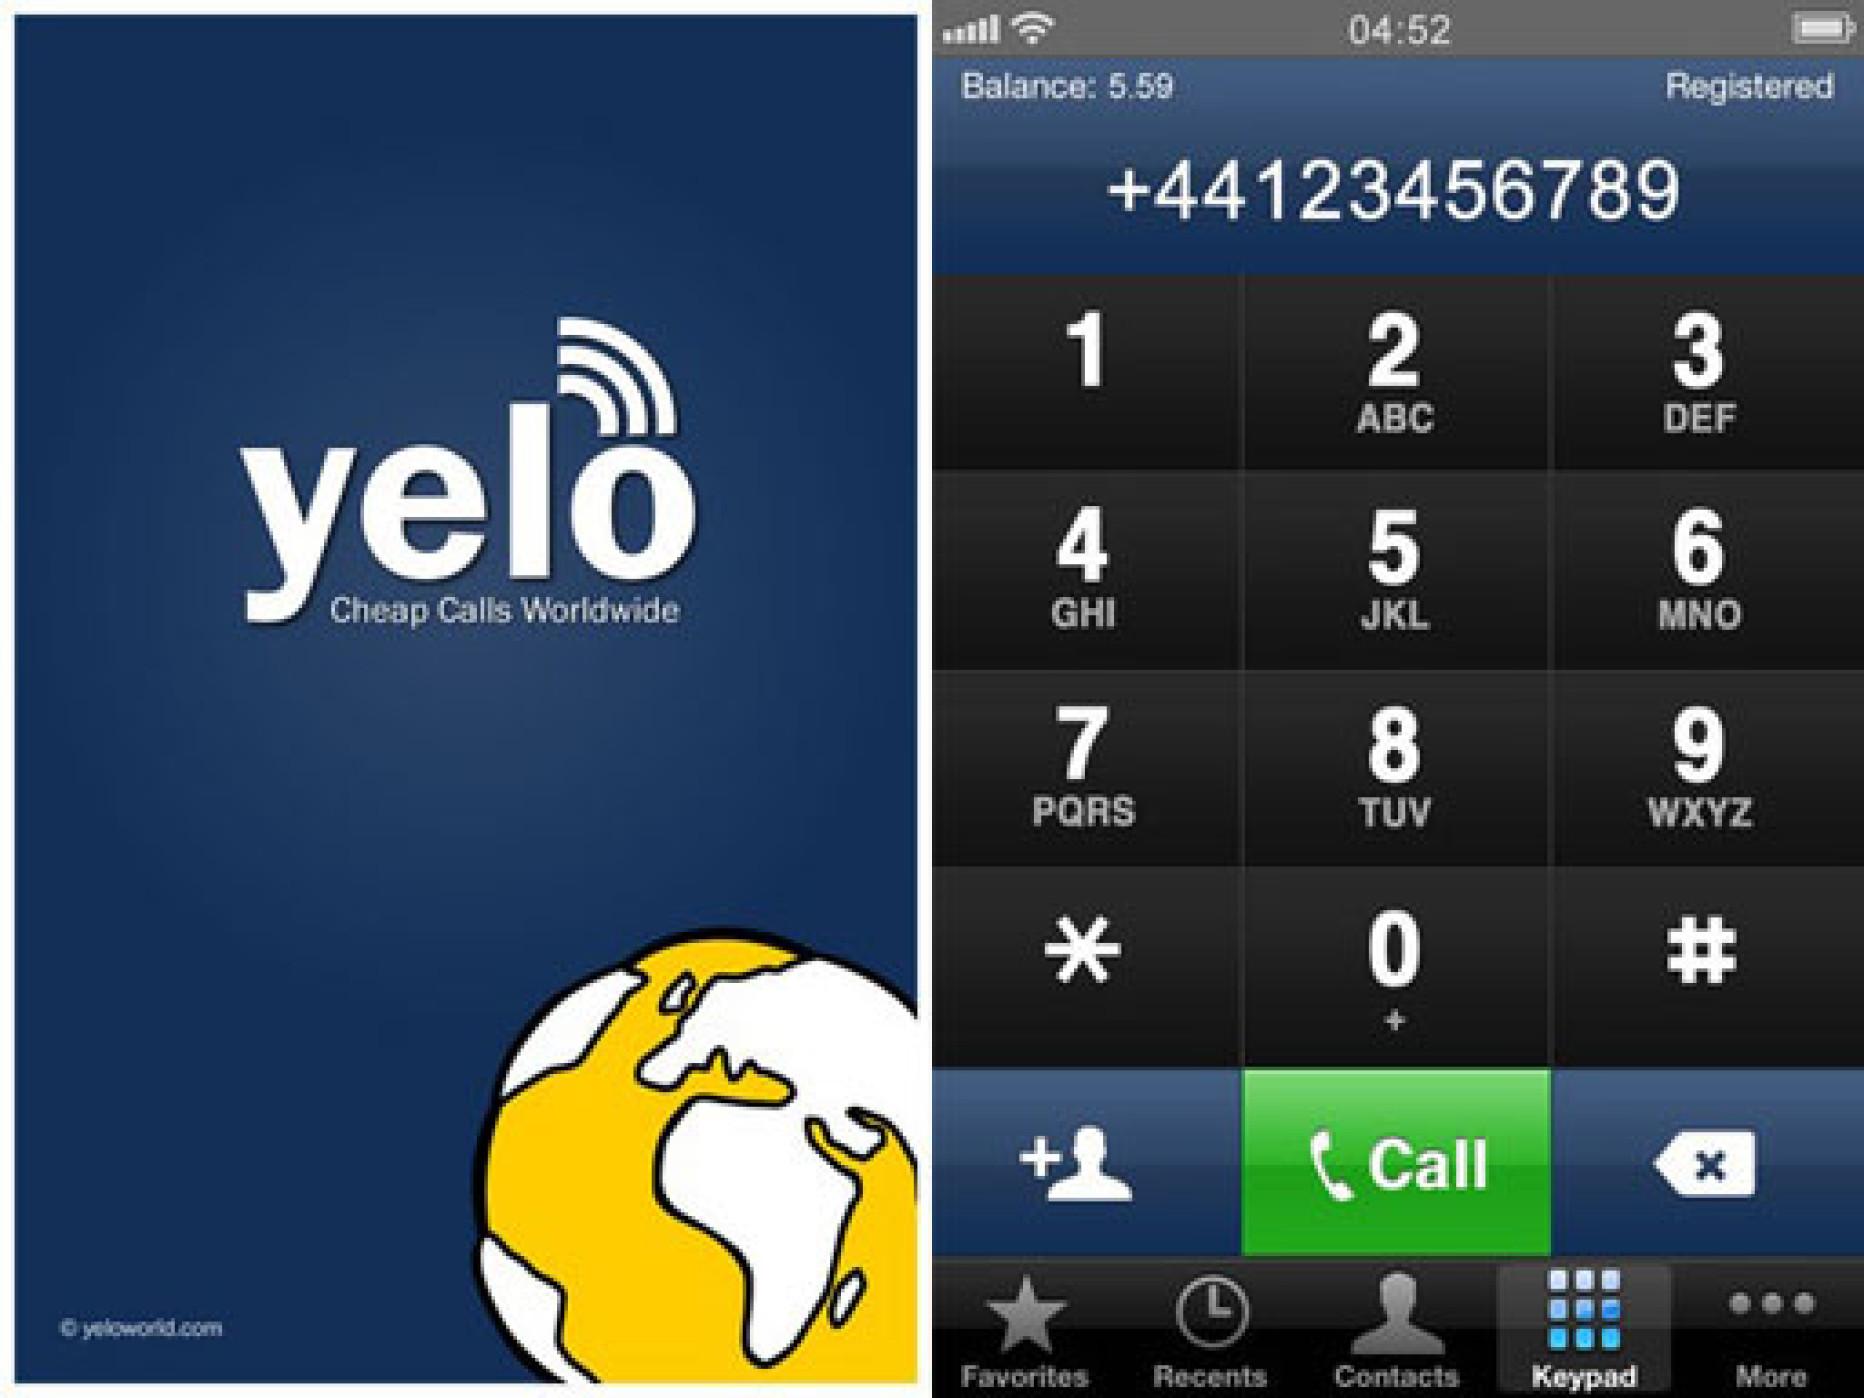 Save on International Calls with Yeloworld